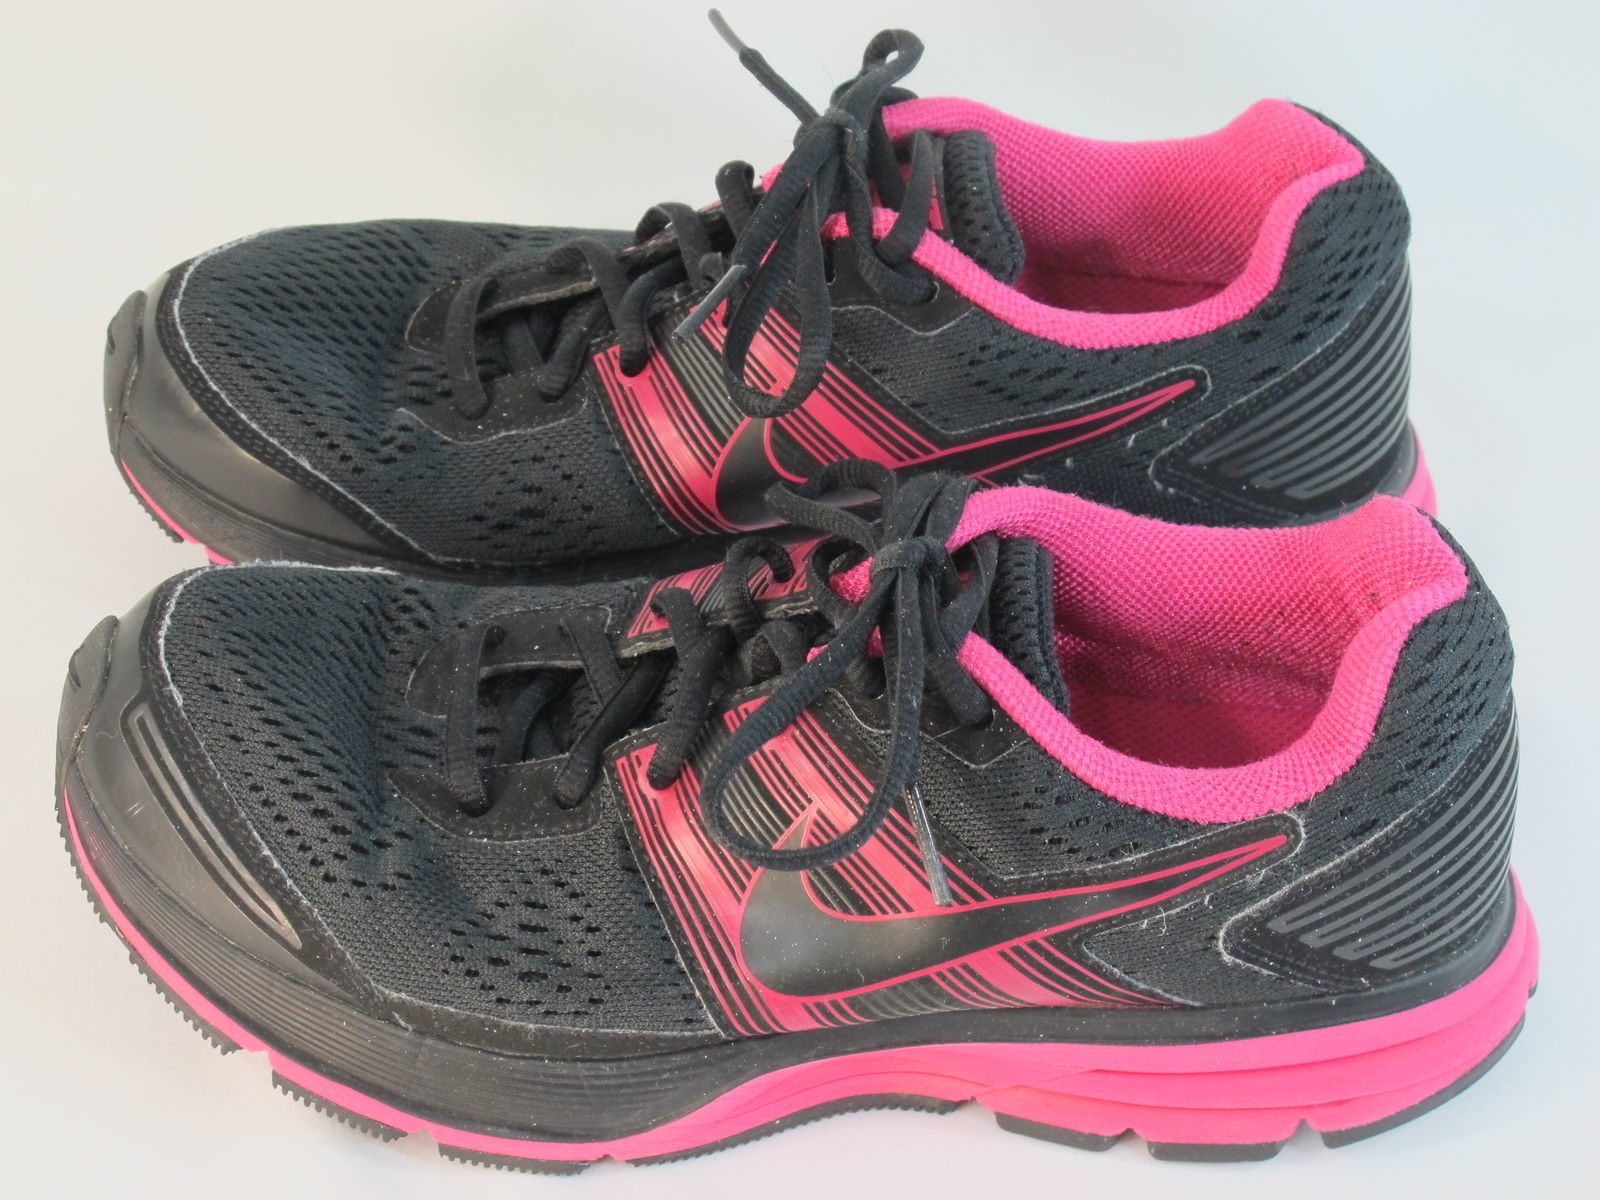 Nike Air Zoom Pegasus+ 29 Running Shoes and 27 similar items